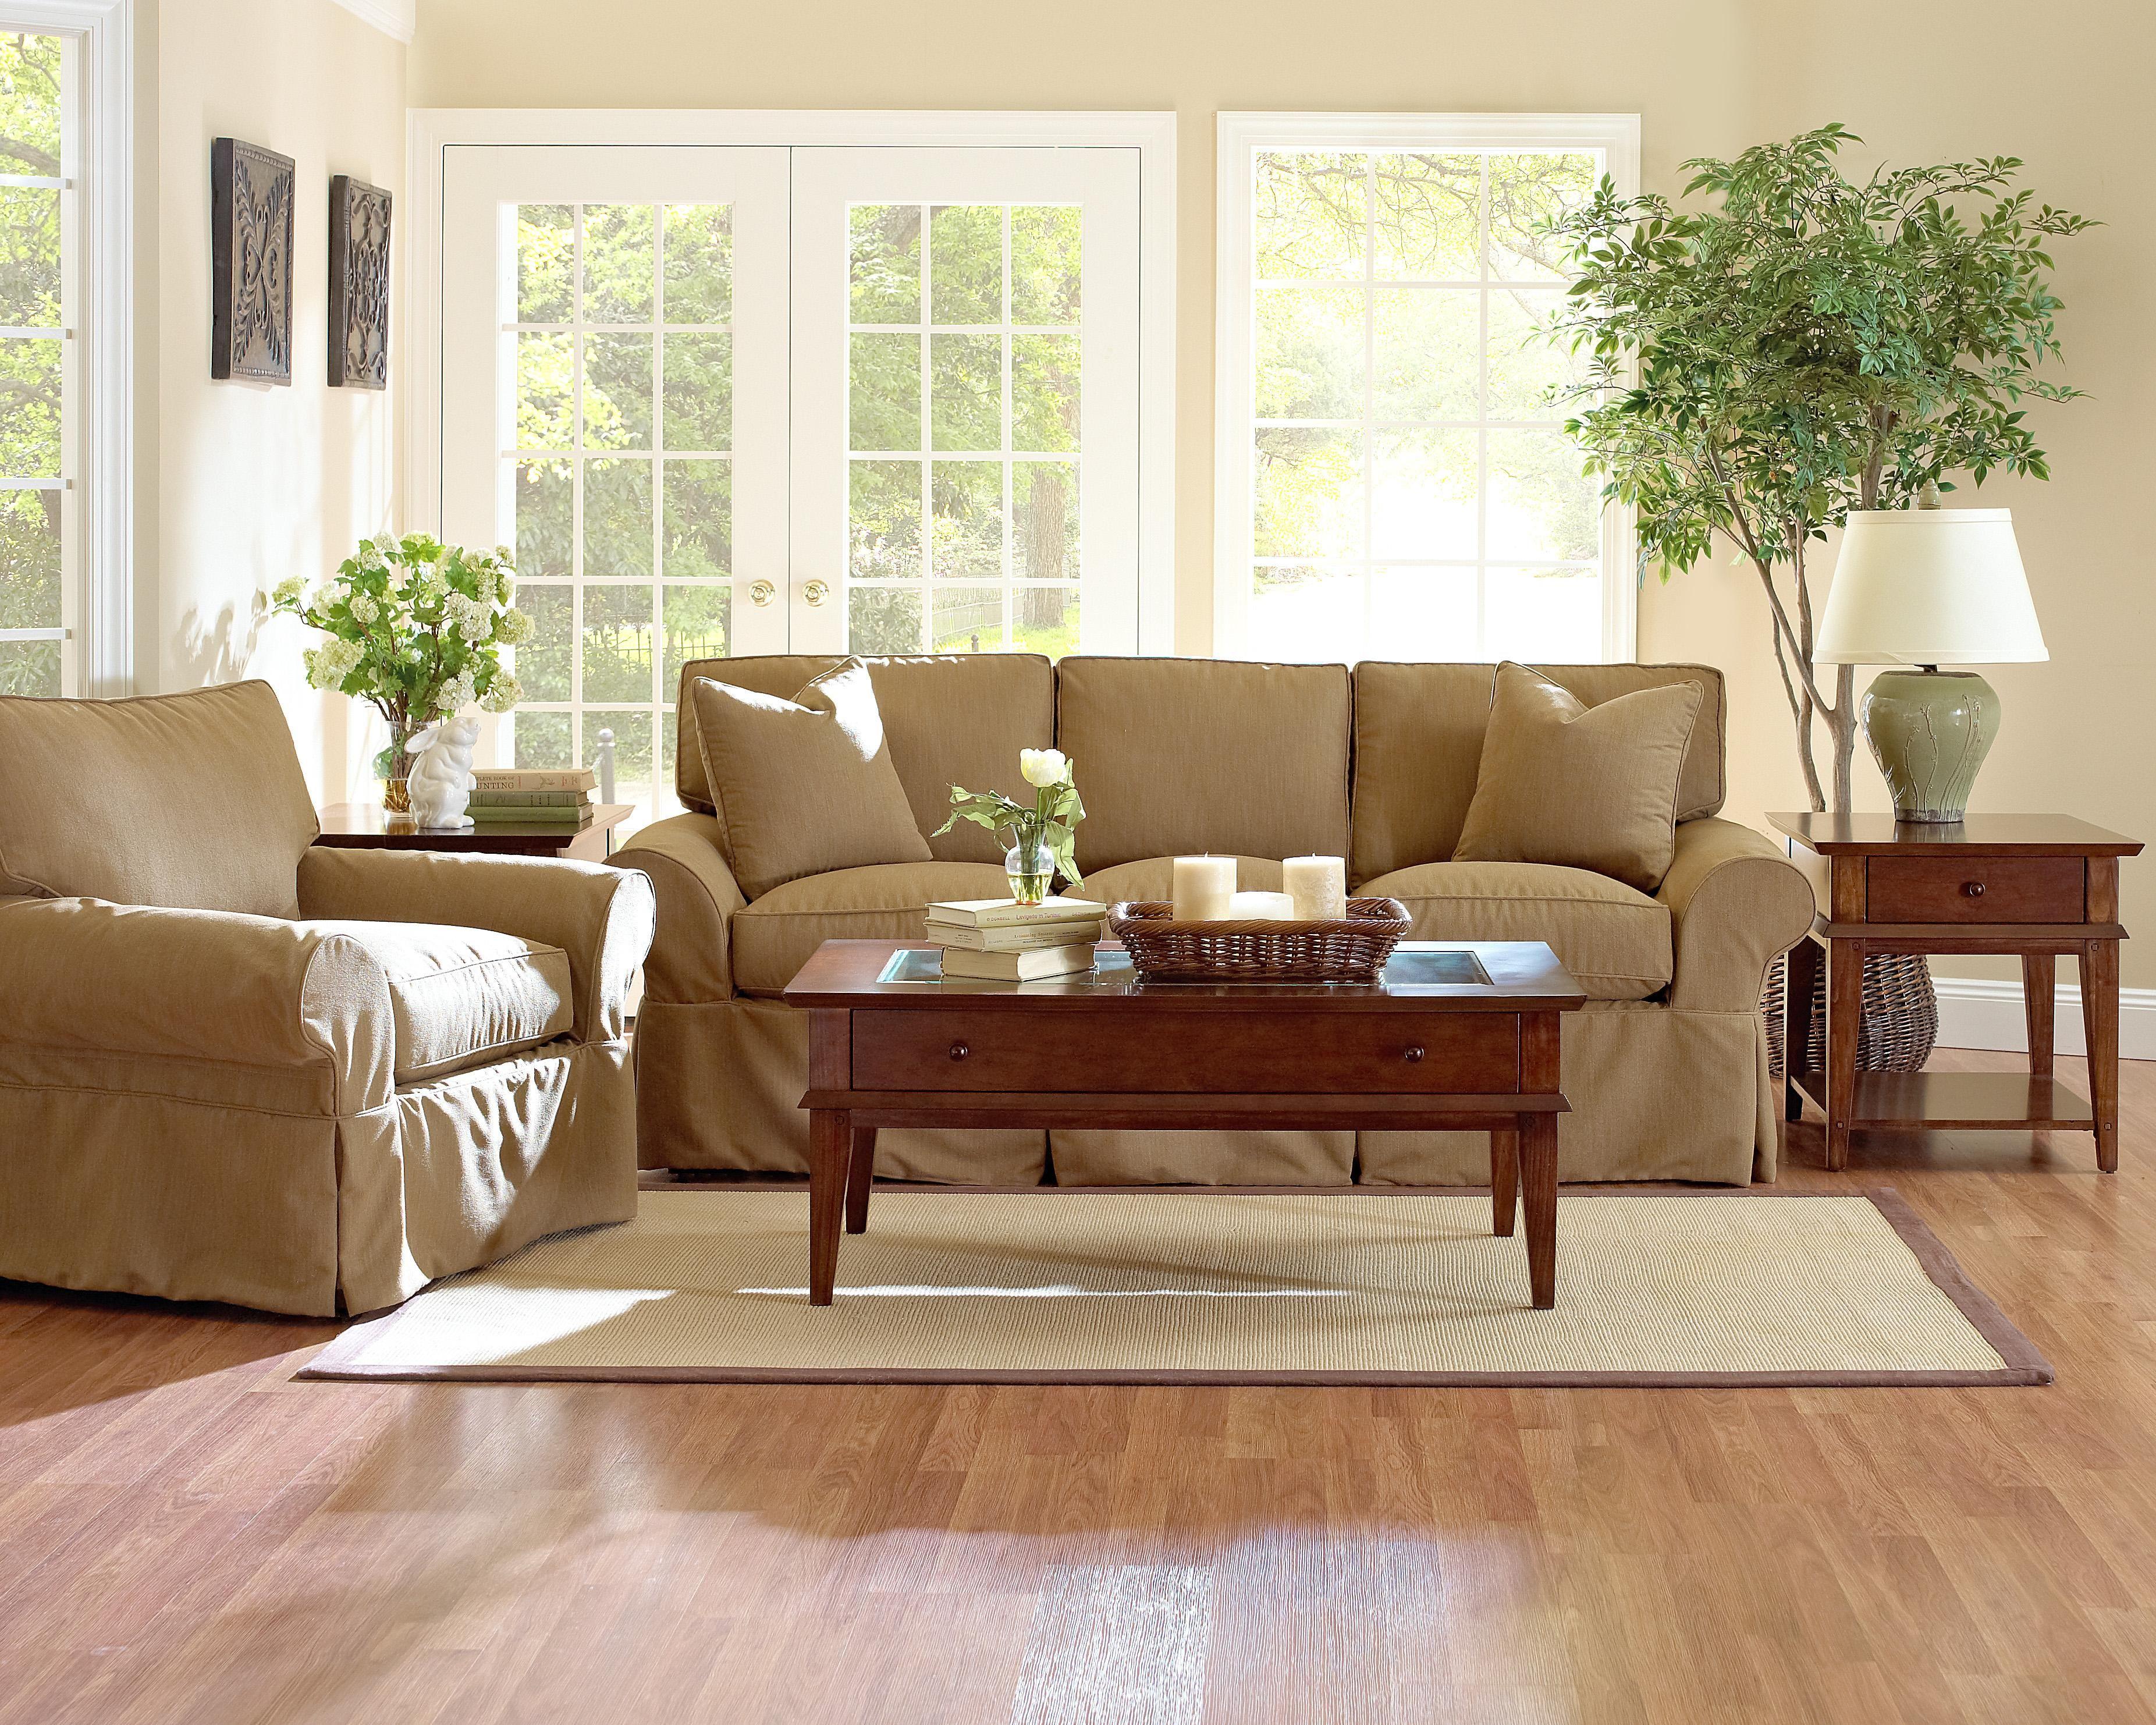 Washable Slipcovered Sofas In 2020 Furniture Slipcovered Sofa